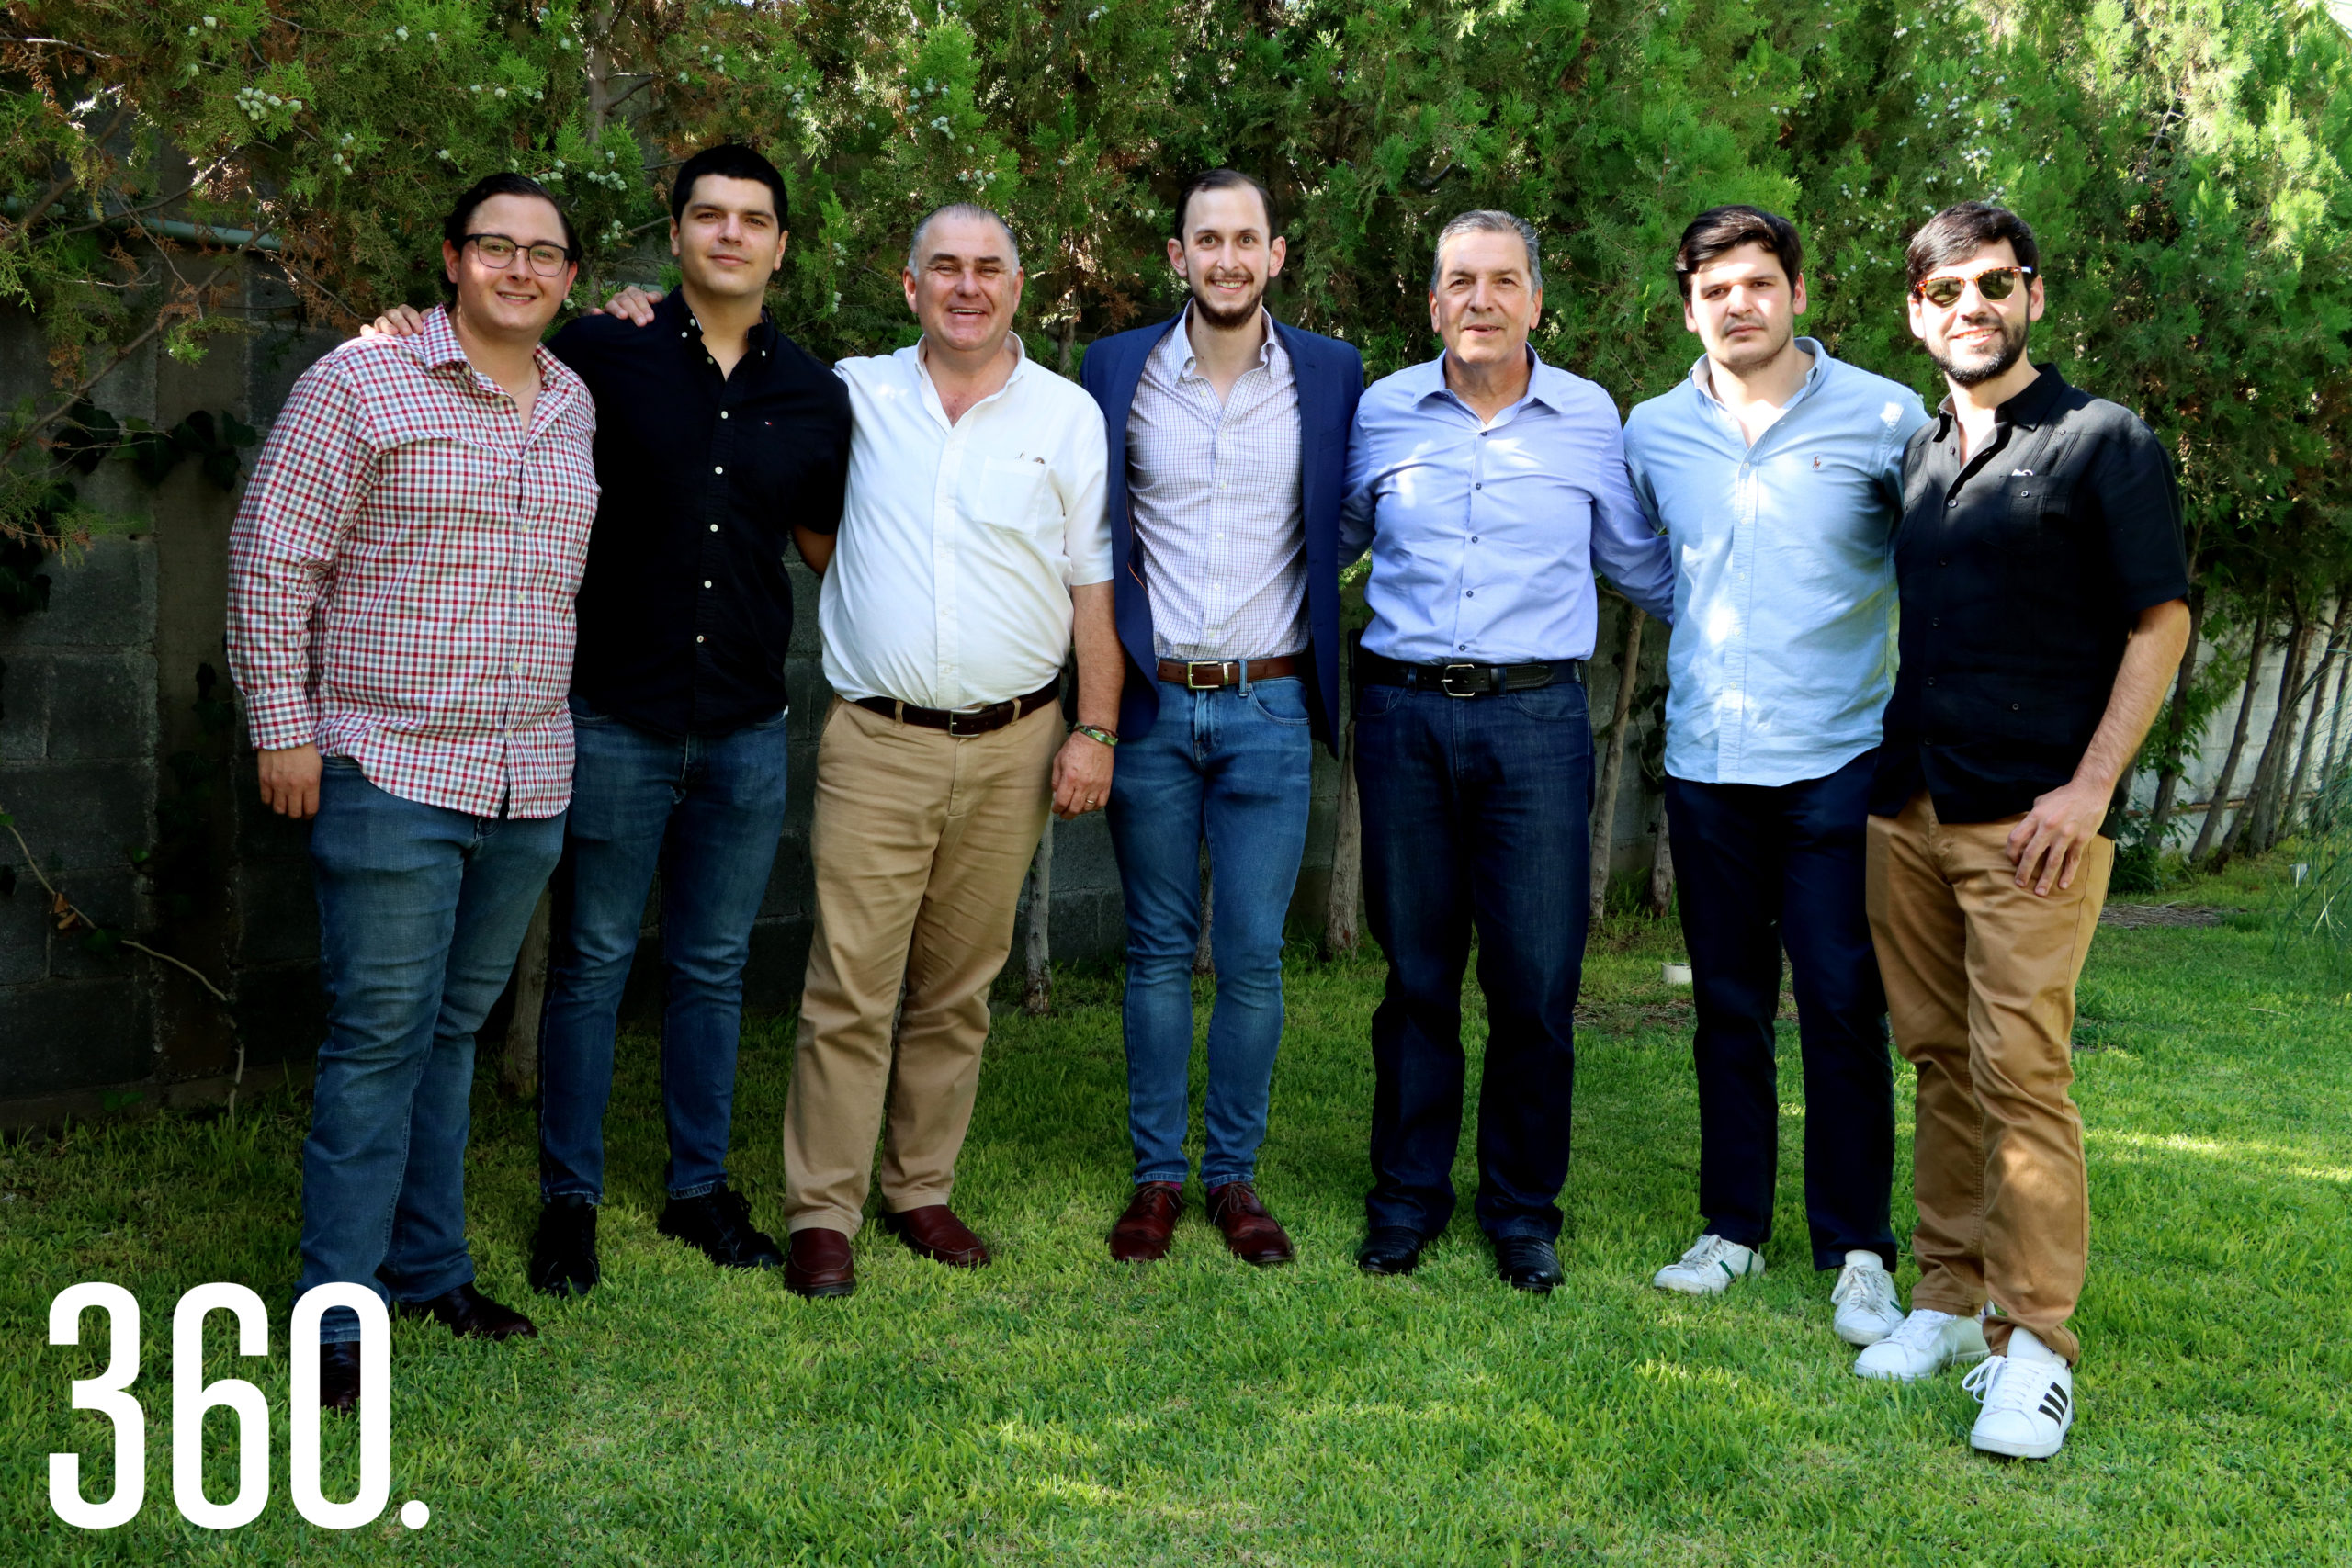 Juan Pablo Dávila, Rogelio Treviño, José Luis Dávila, José Luis Dávila, Rubén, Rodrigo y Rubén Treviño.